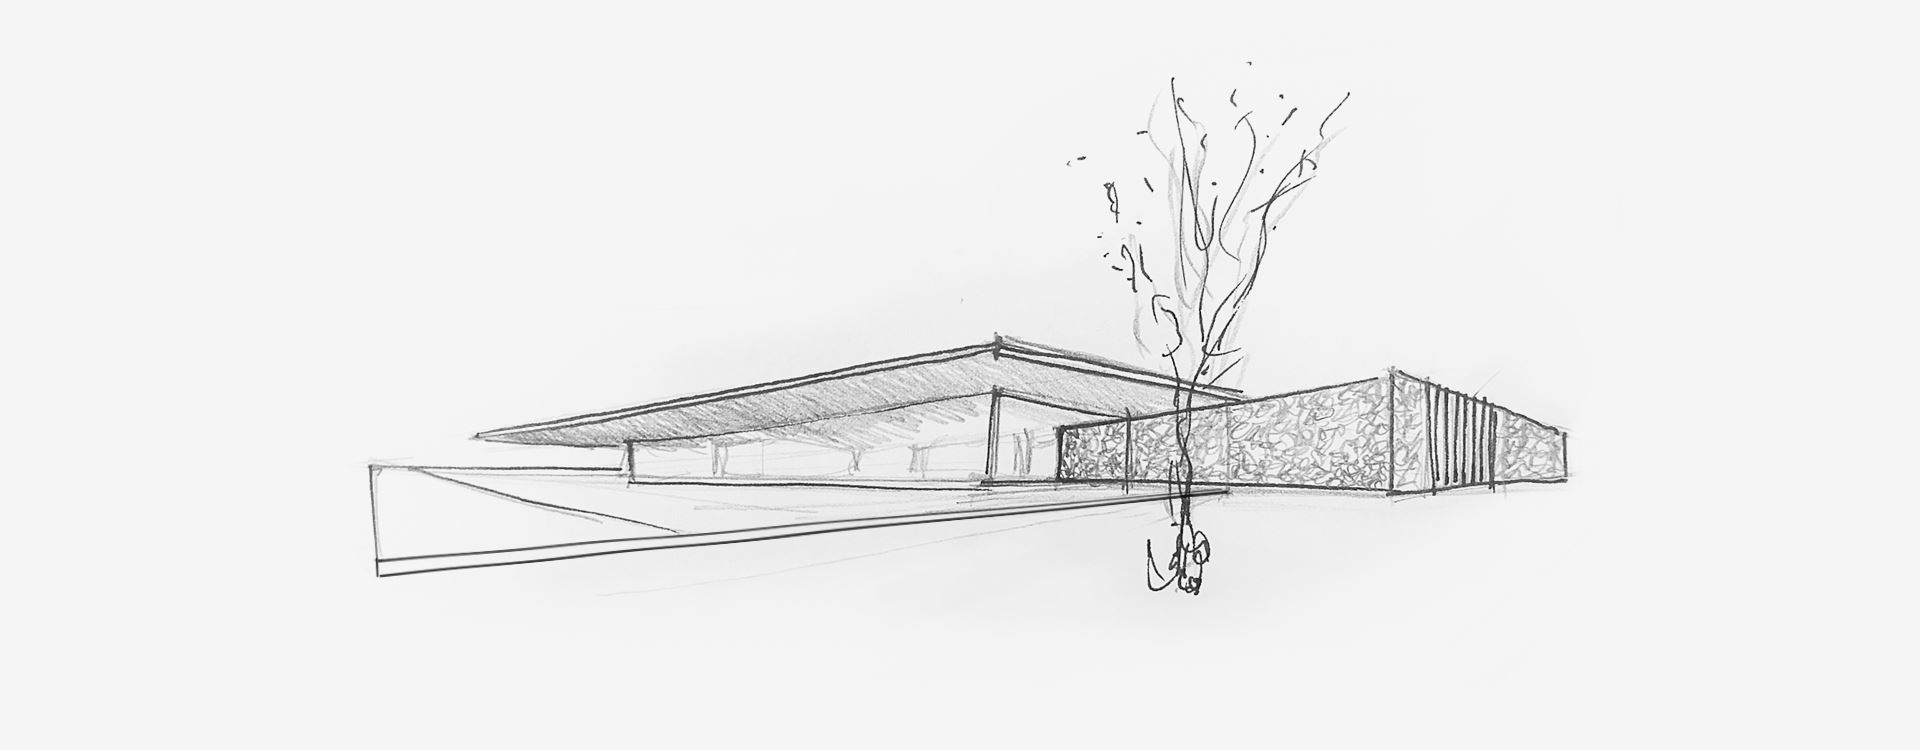 Draft - Gallardo Llopis Architect